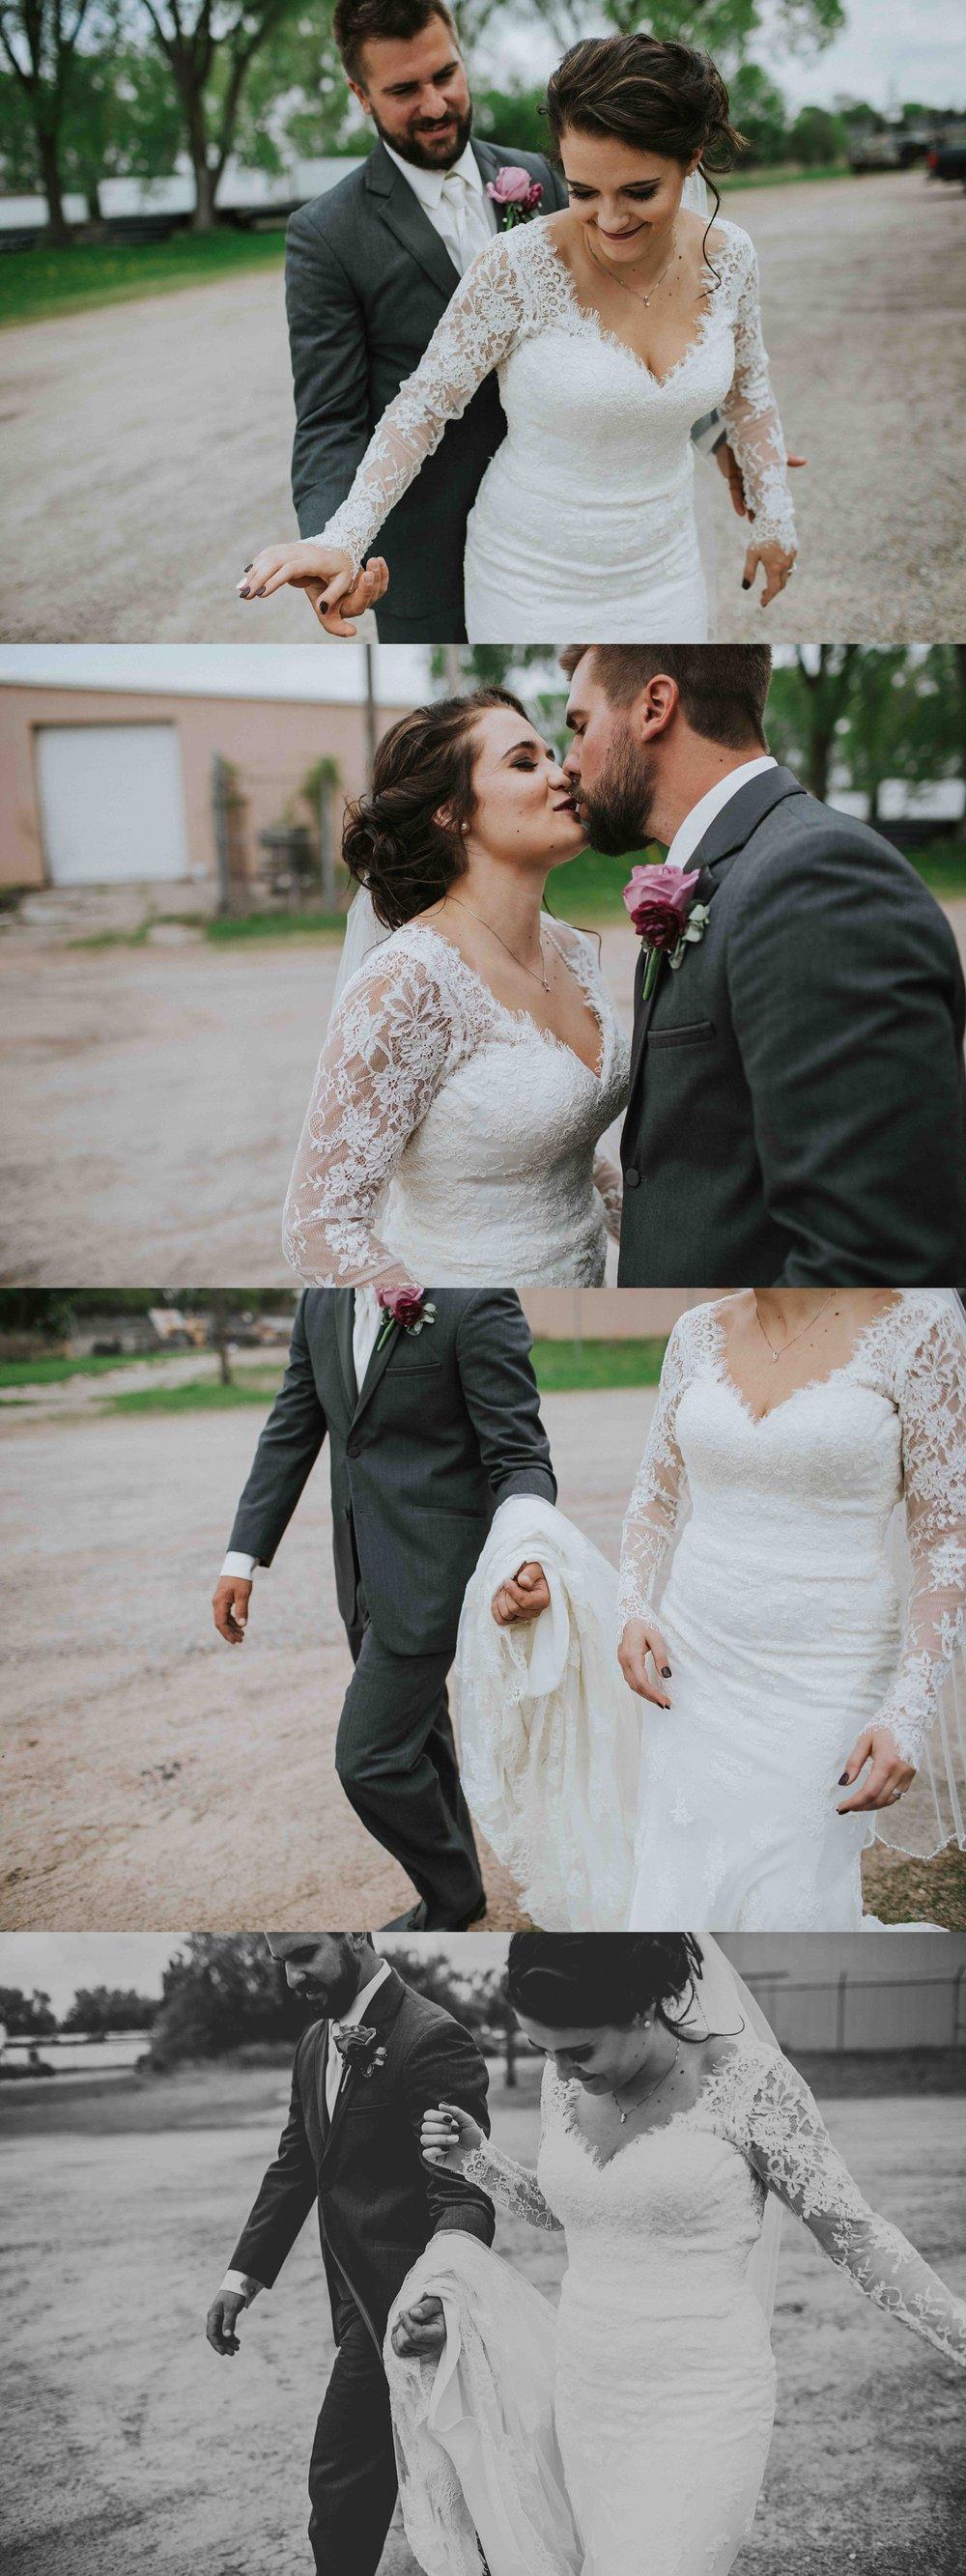 Ridges Golf Course Central Wisconsin Wedding Photographer Chloe Ann Photography_0014.jpg